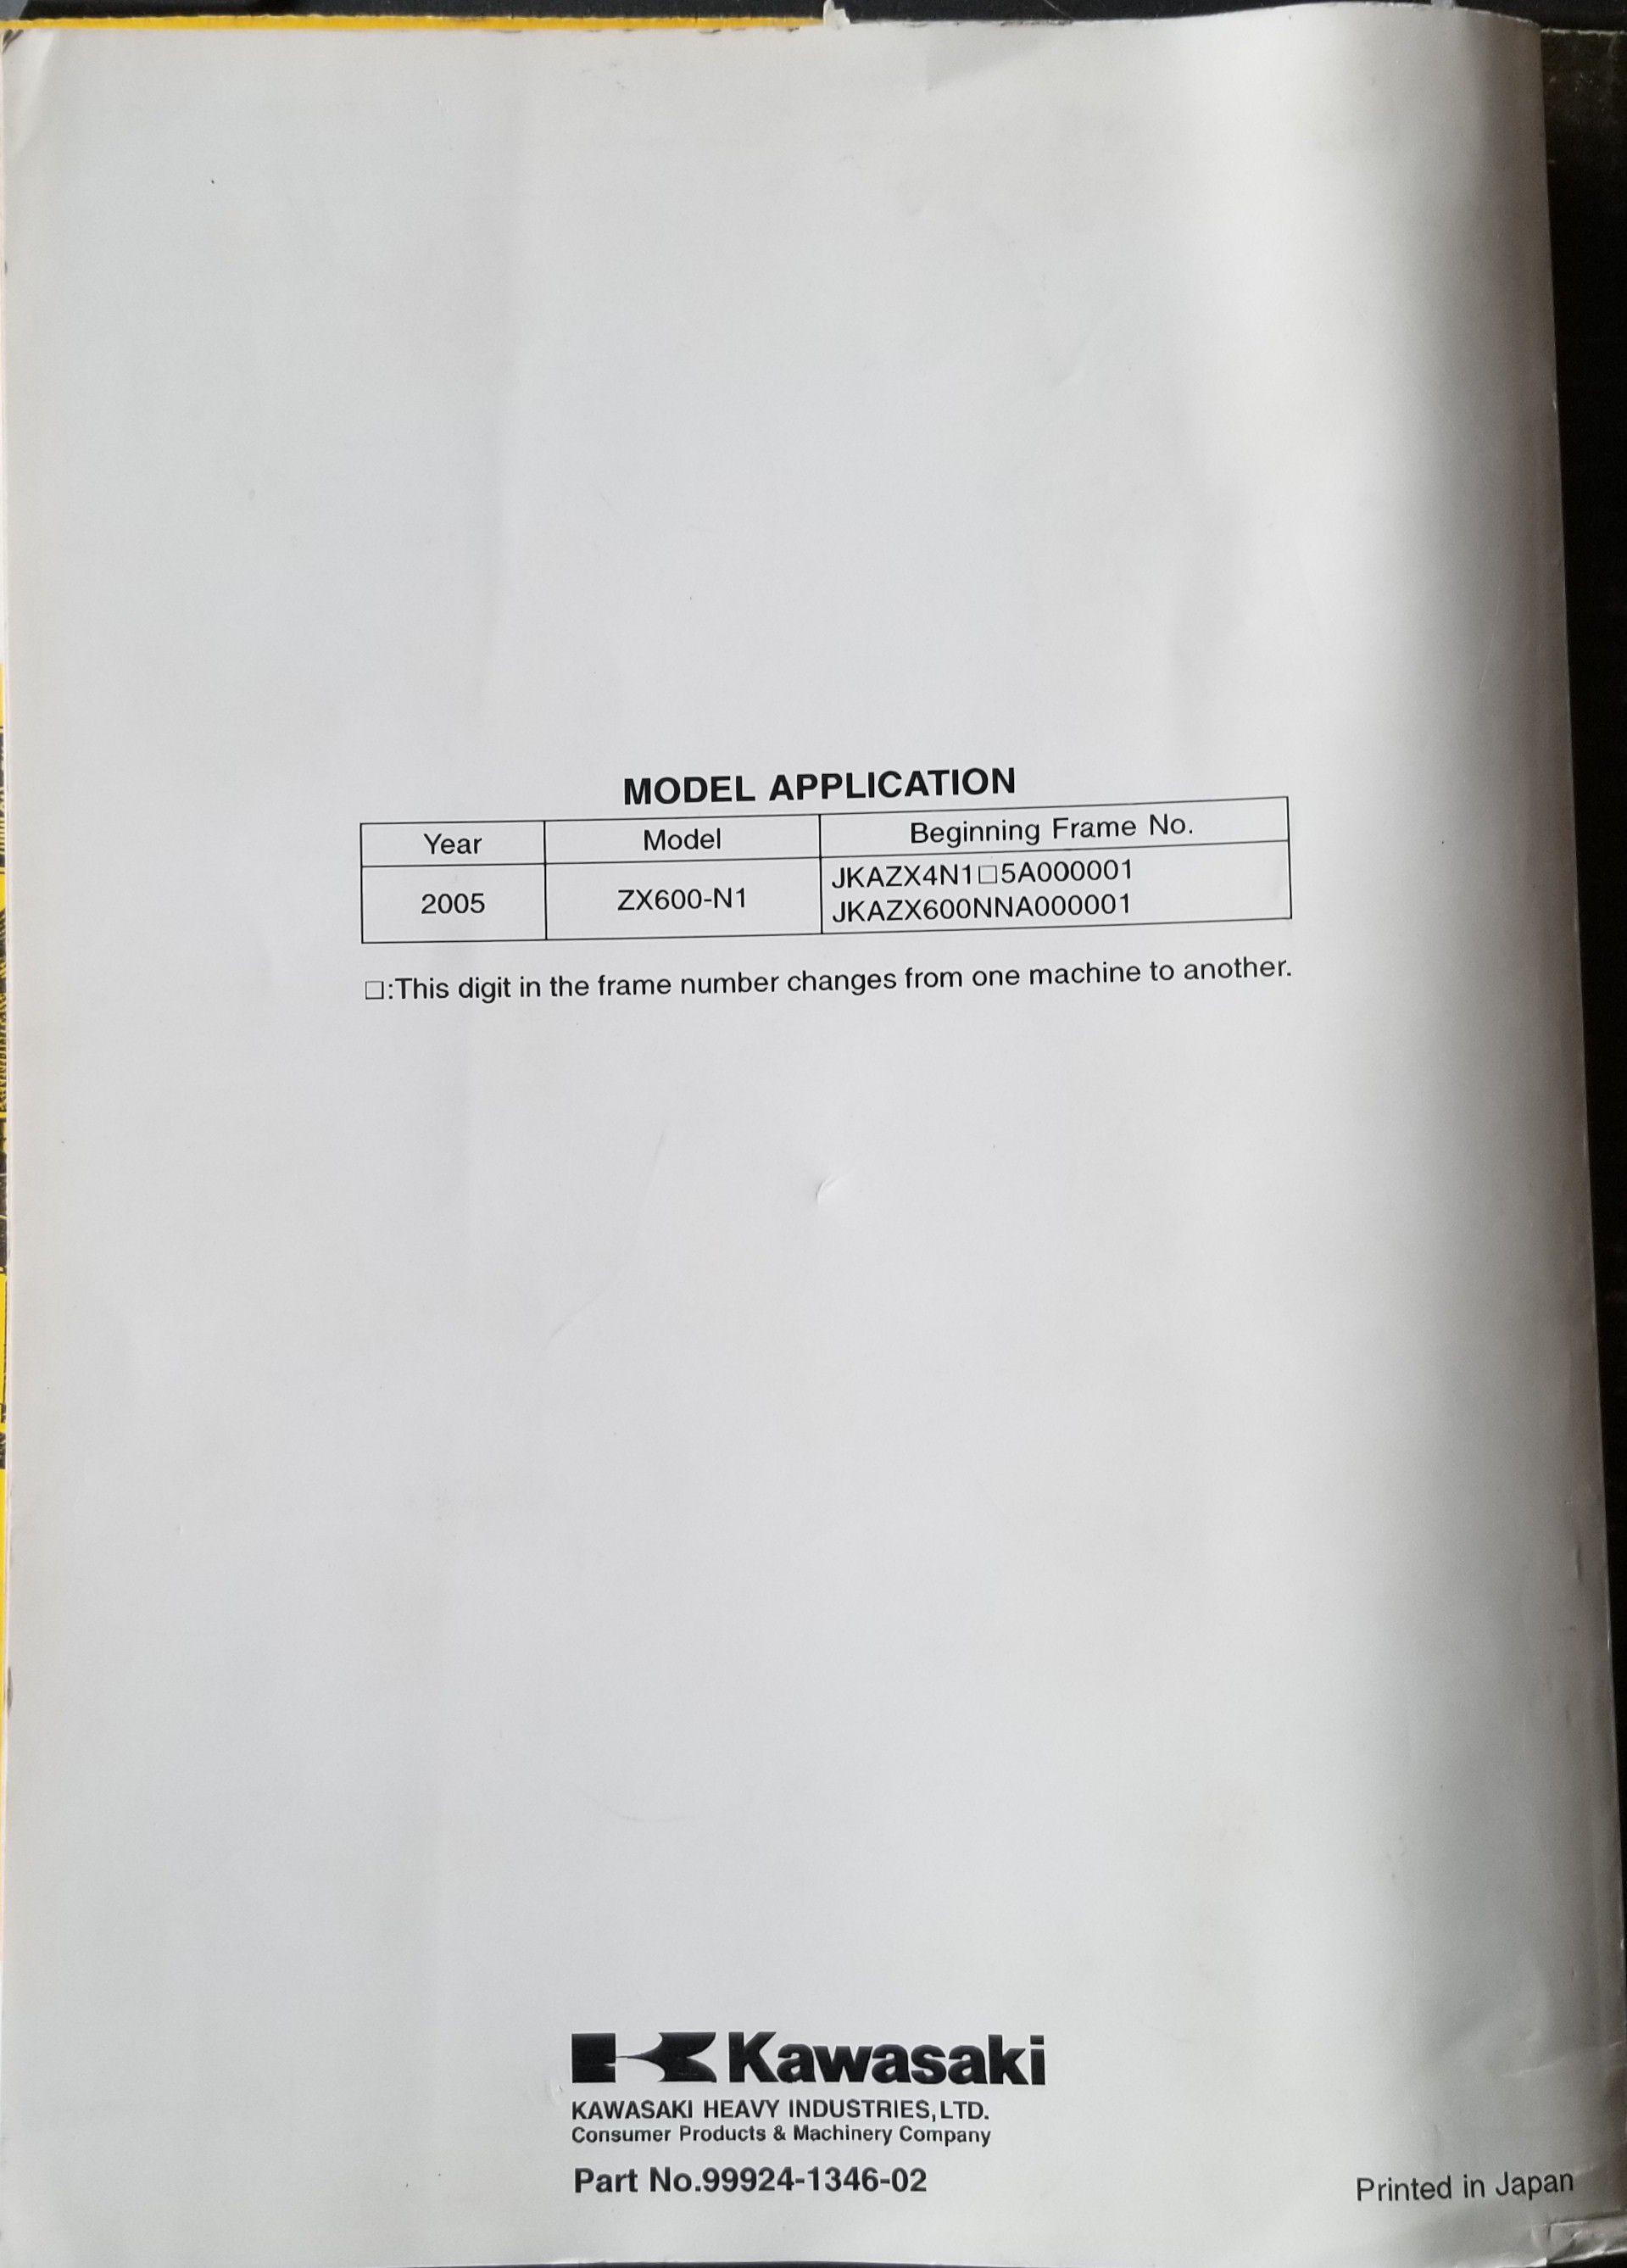 Kawasaki Ninja ZX-6RR service manual